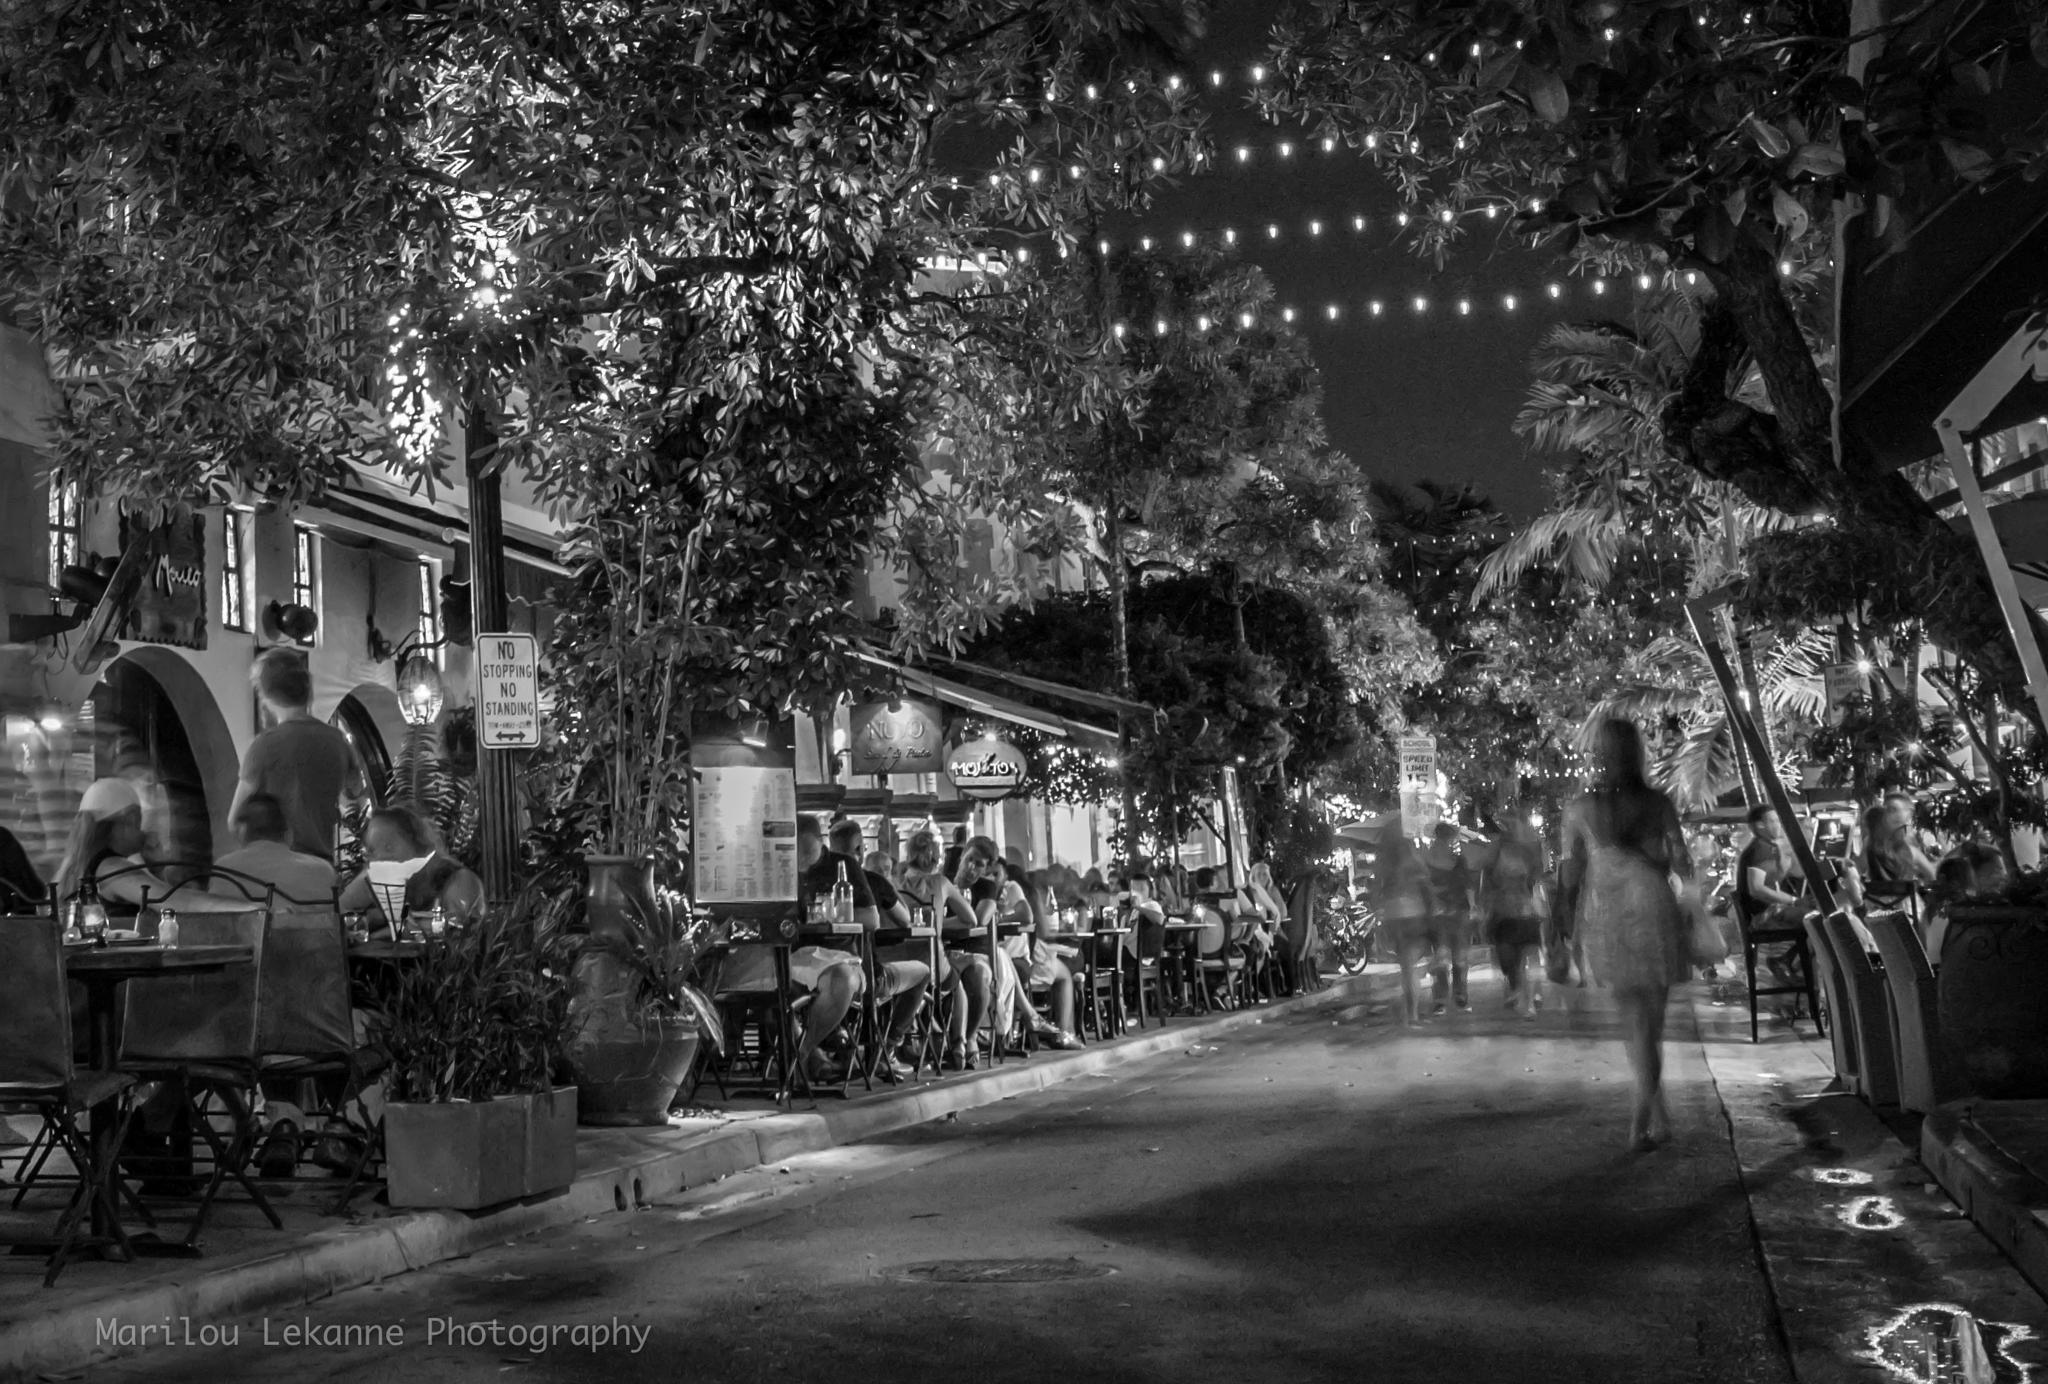 Española Way at Night by Marilou Lekanne